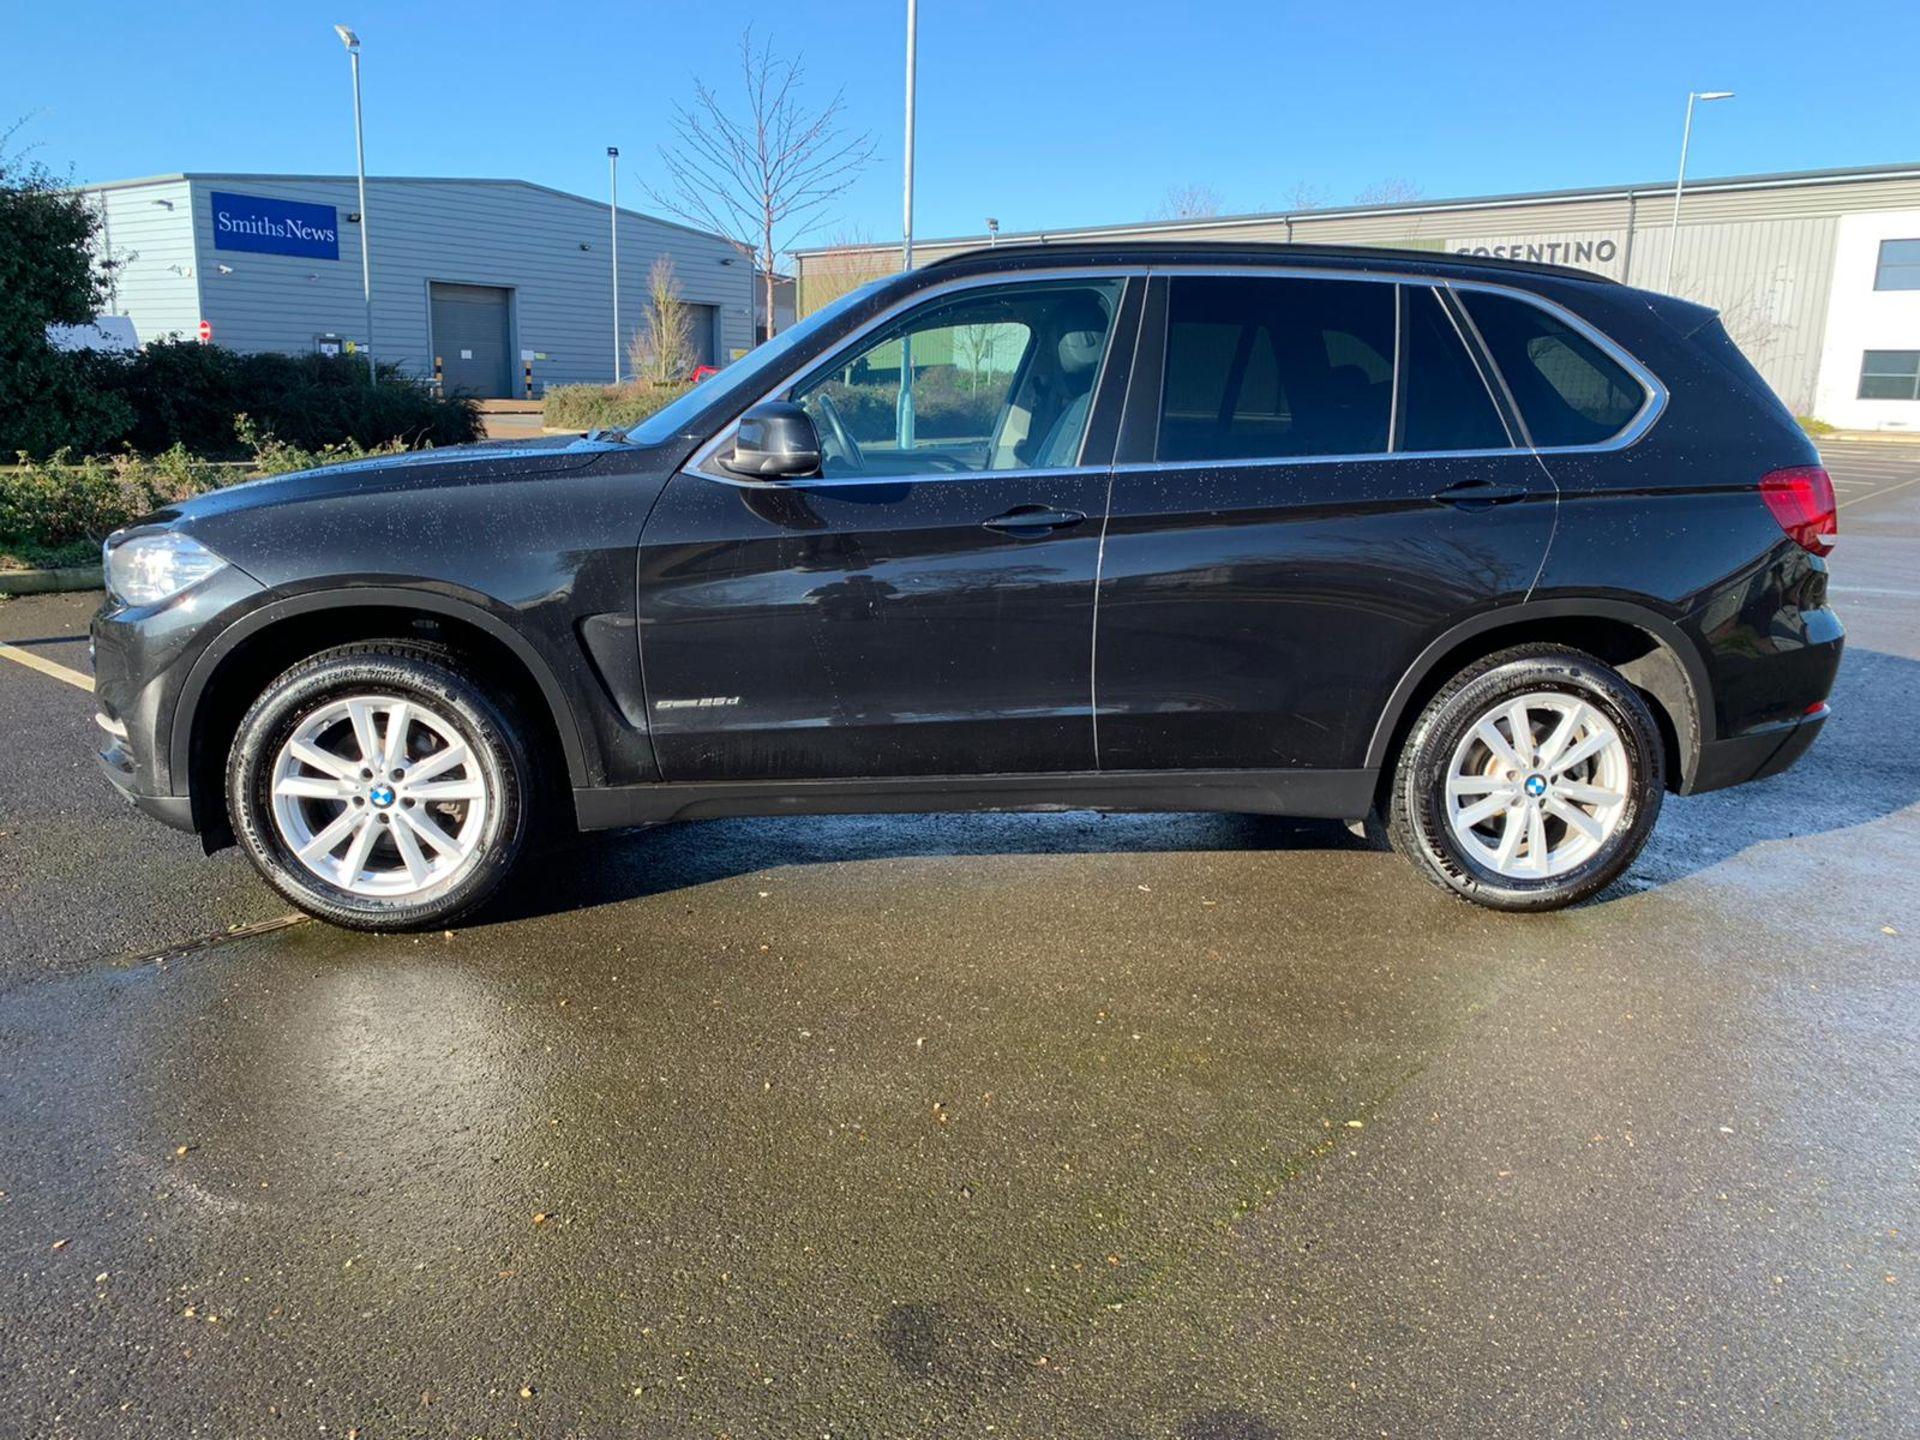 "(Reserve Met) BMW X5 2.0d S-DRIVE ""Special Equipment"" Auto- 7 Seater -16 Reg - Sat Nav- (New Shape) - Image 5 of 43"